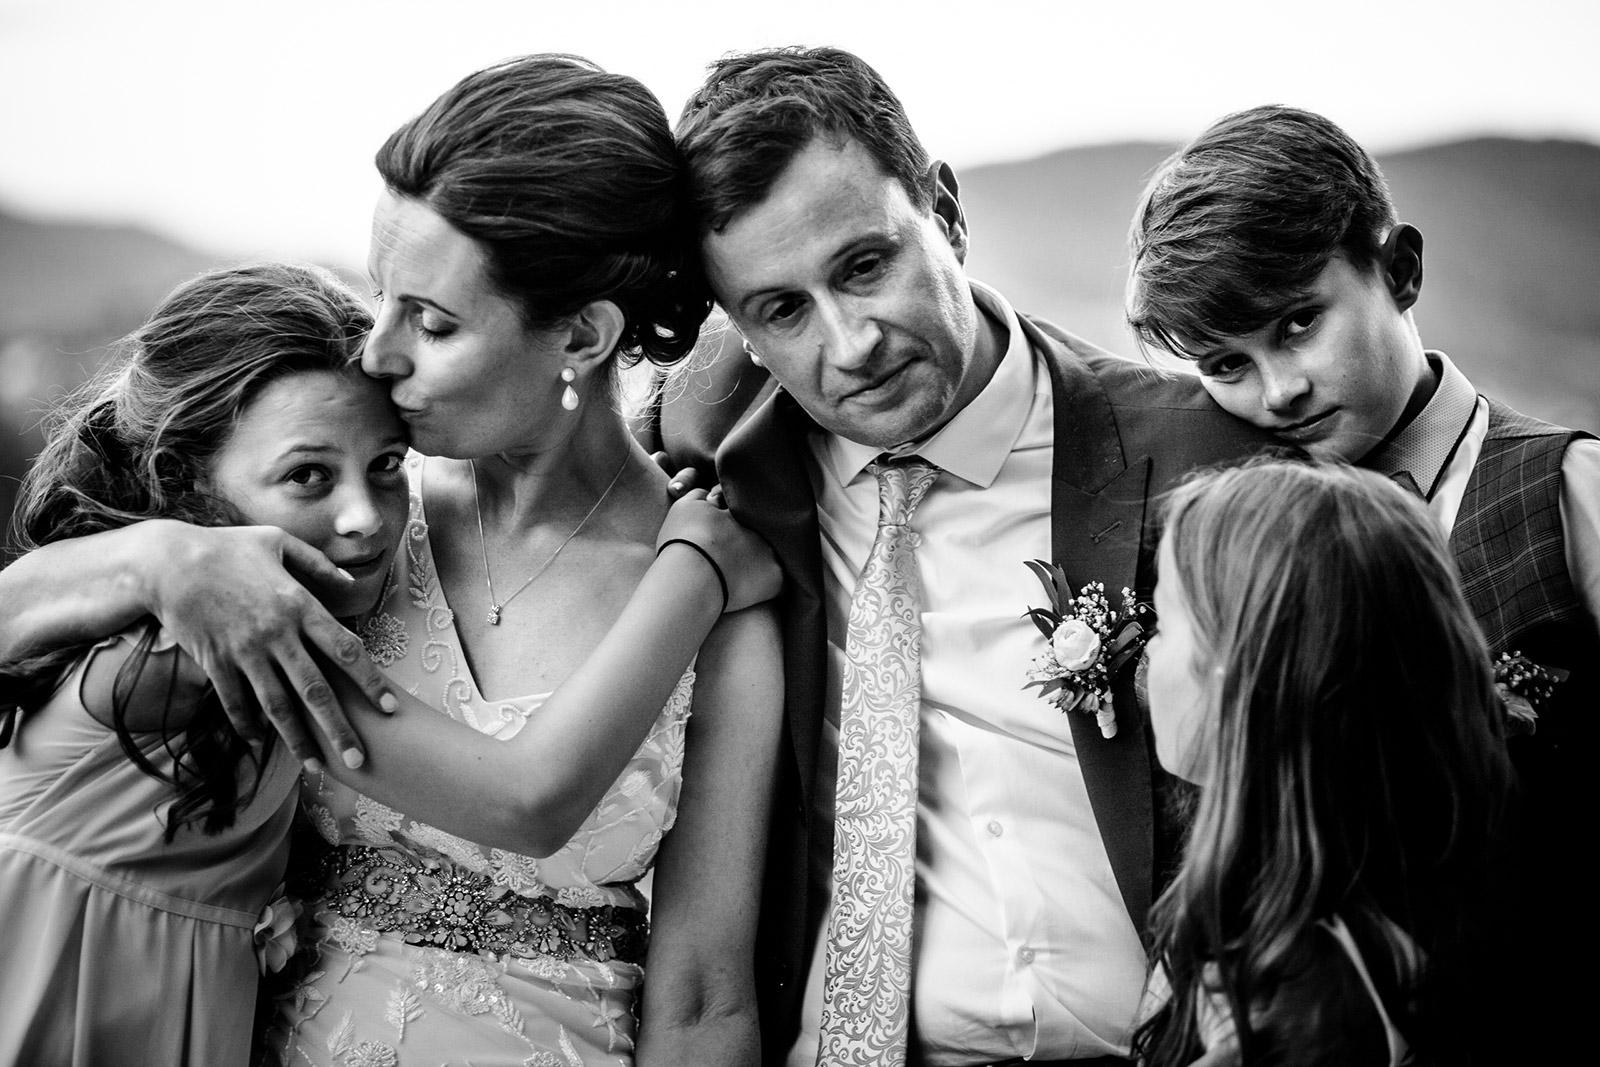 meilleurs avis photographe de mariage Lantignié Photographe de mariage au château des Vergers